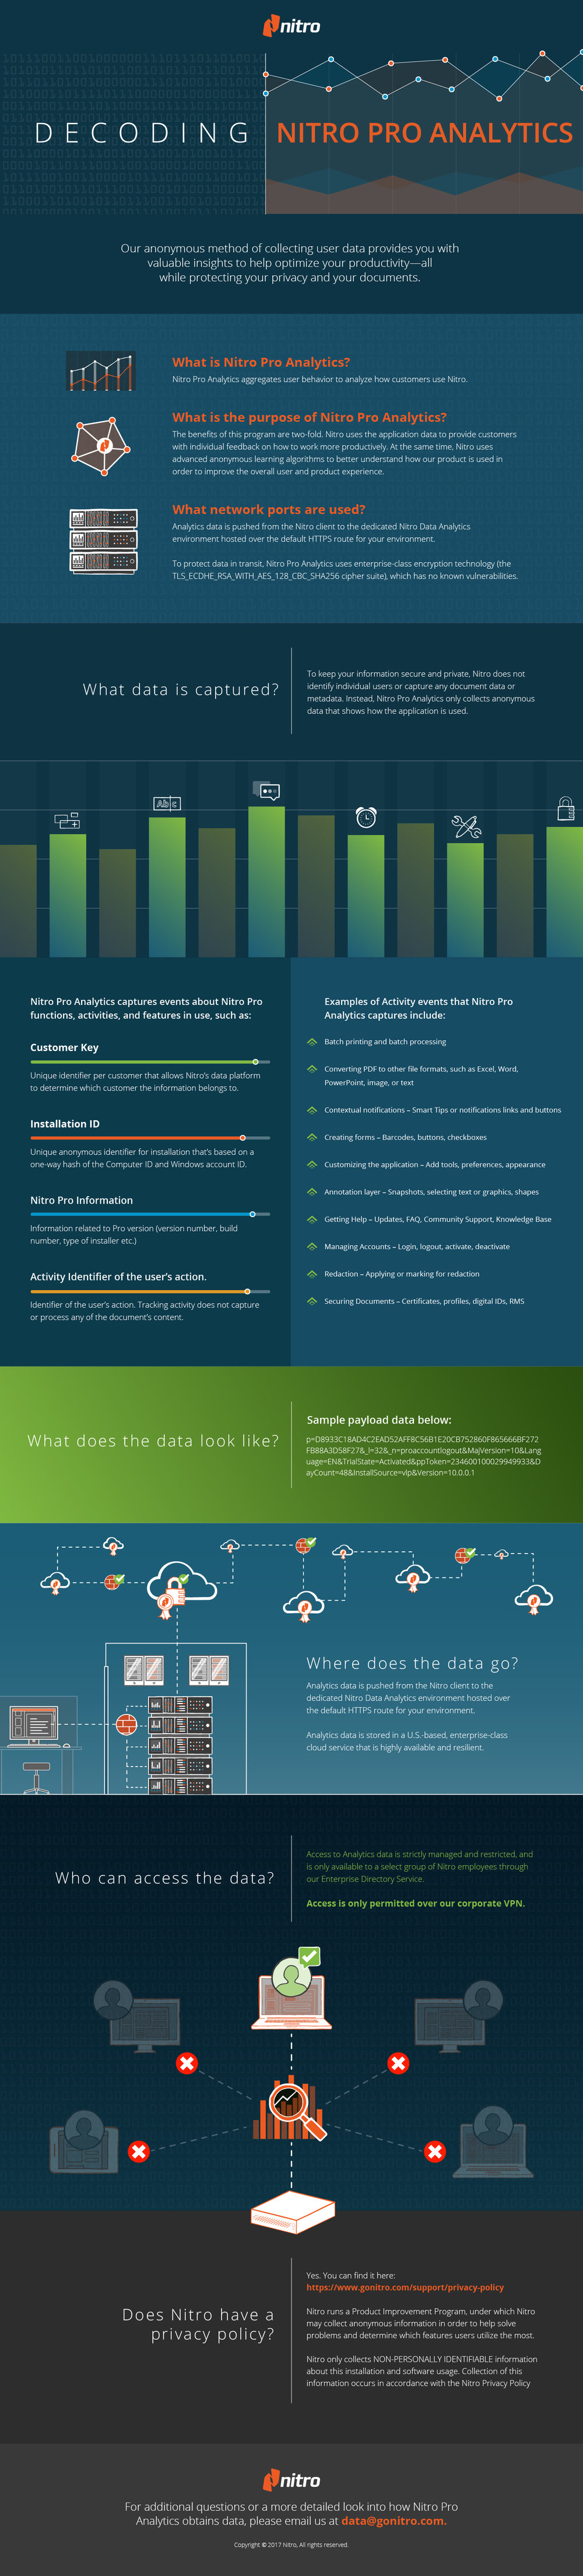 Security FAQ - Infographic.jpg